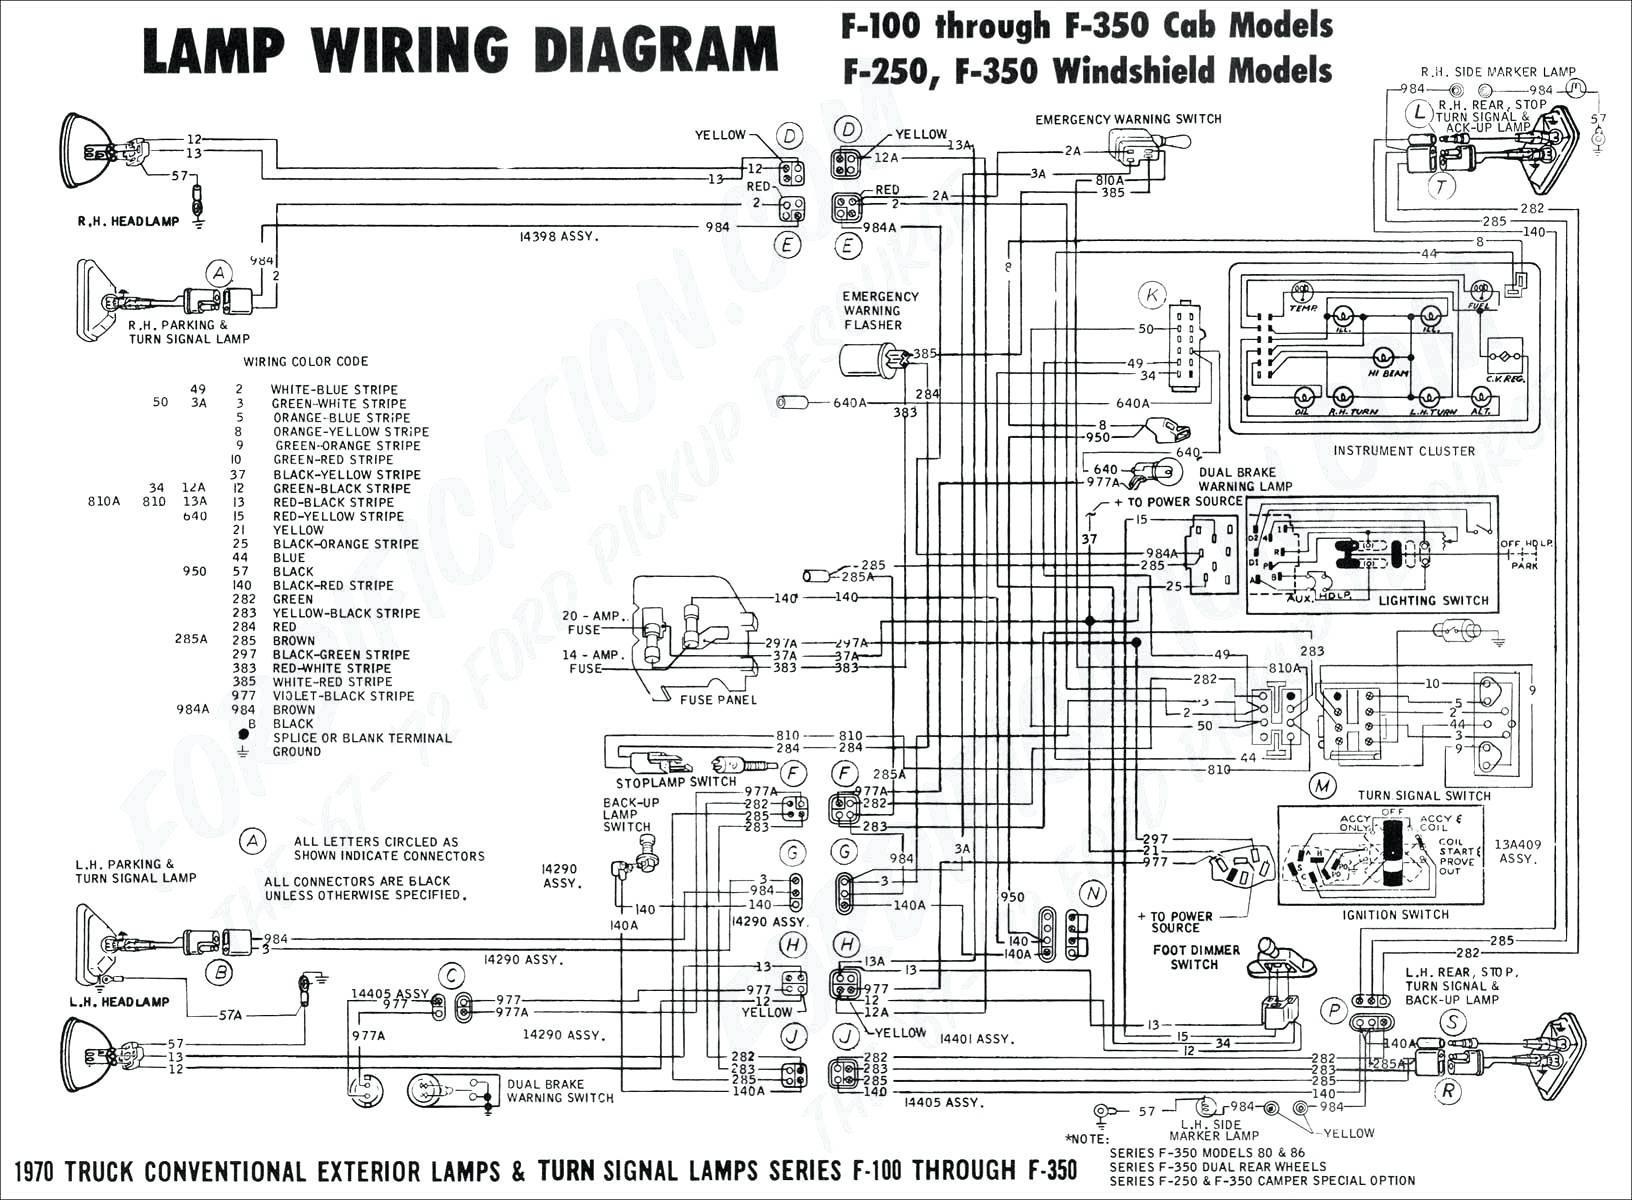 2008 ford Fusion Engine Diagram 07 F250 Wiring Diagram Another Blog About Wiring Diagram • Of 2008 ford Fusion Engine Diagram